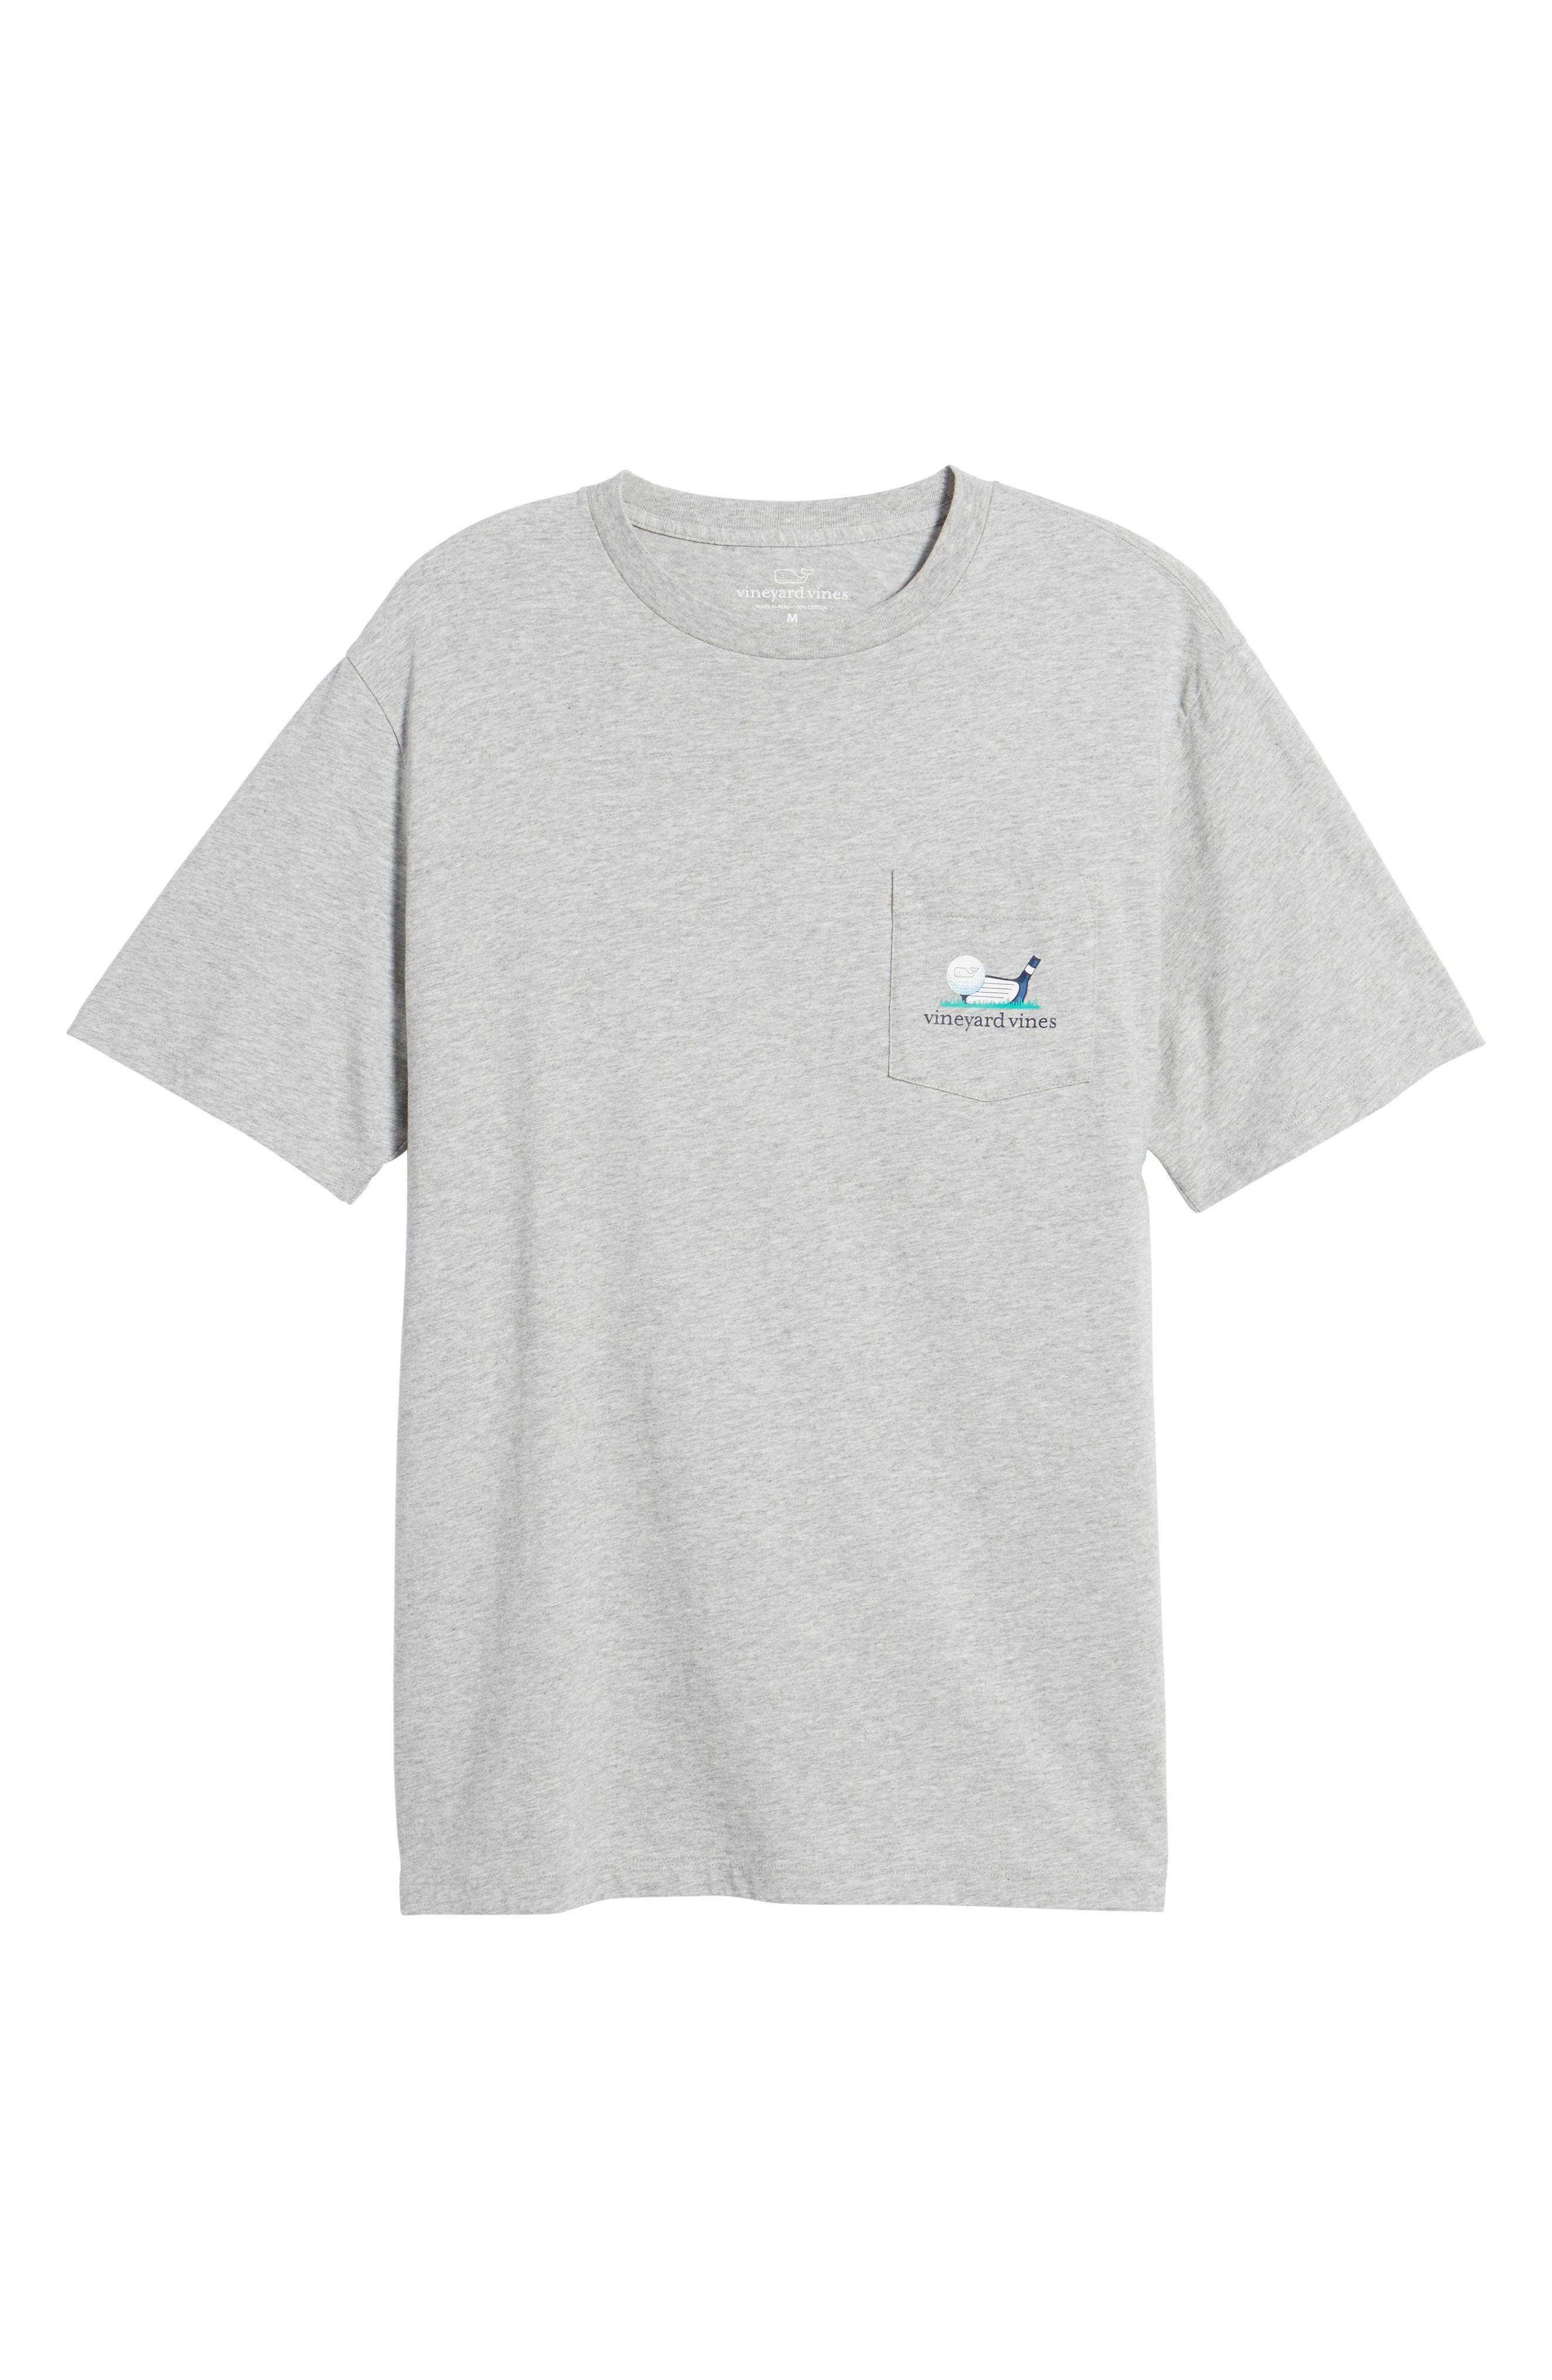 Regular Fit Golf T-Shirt,                             Alternate thumbnail 6, color,                             Gray Heather